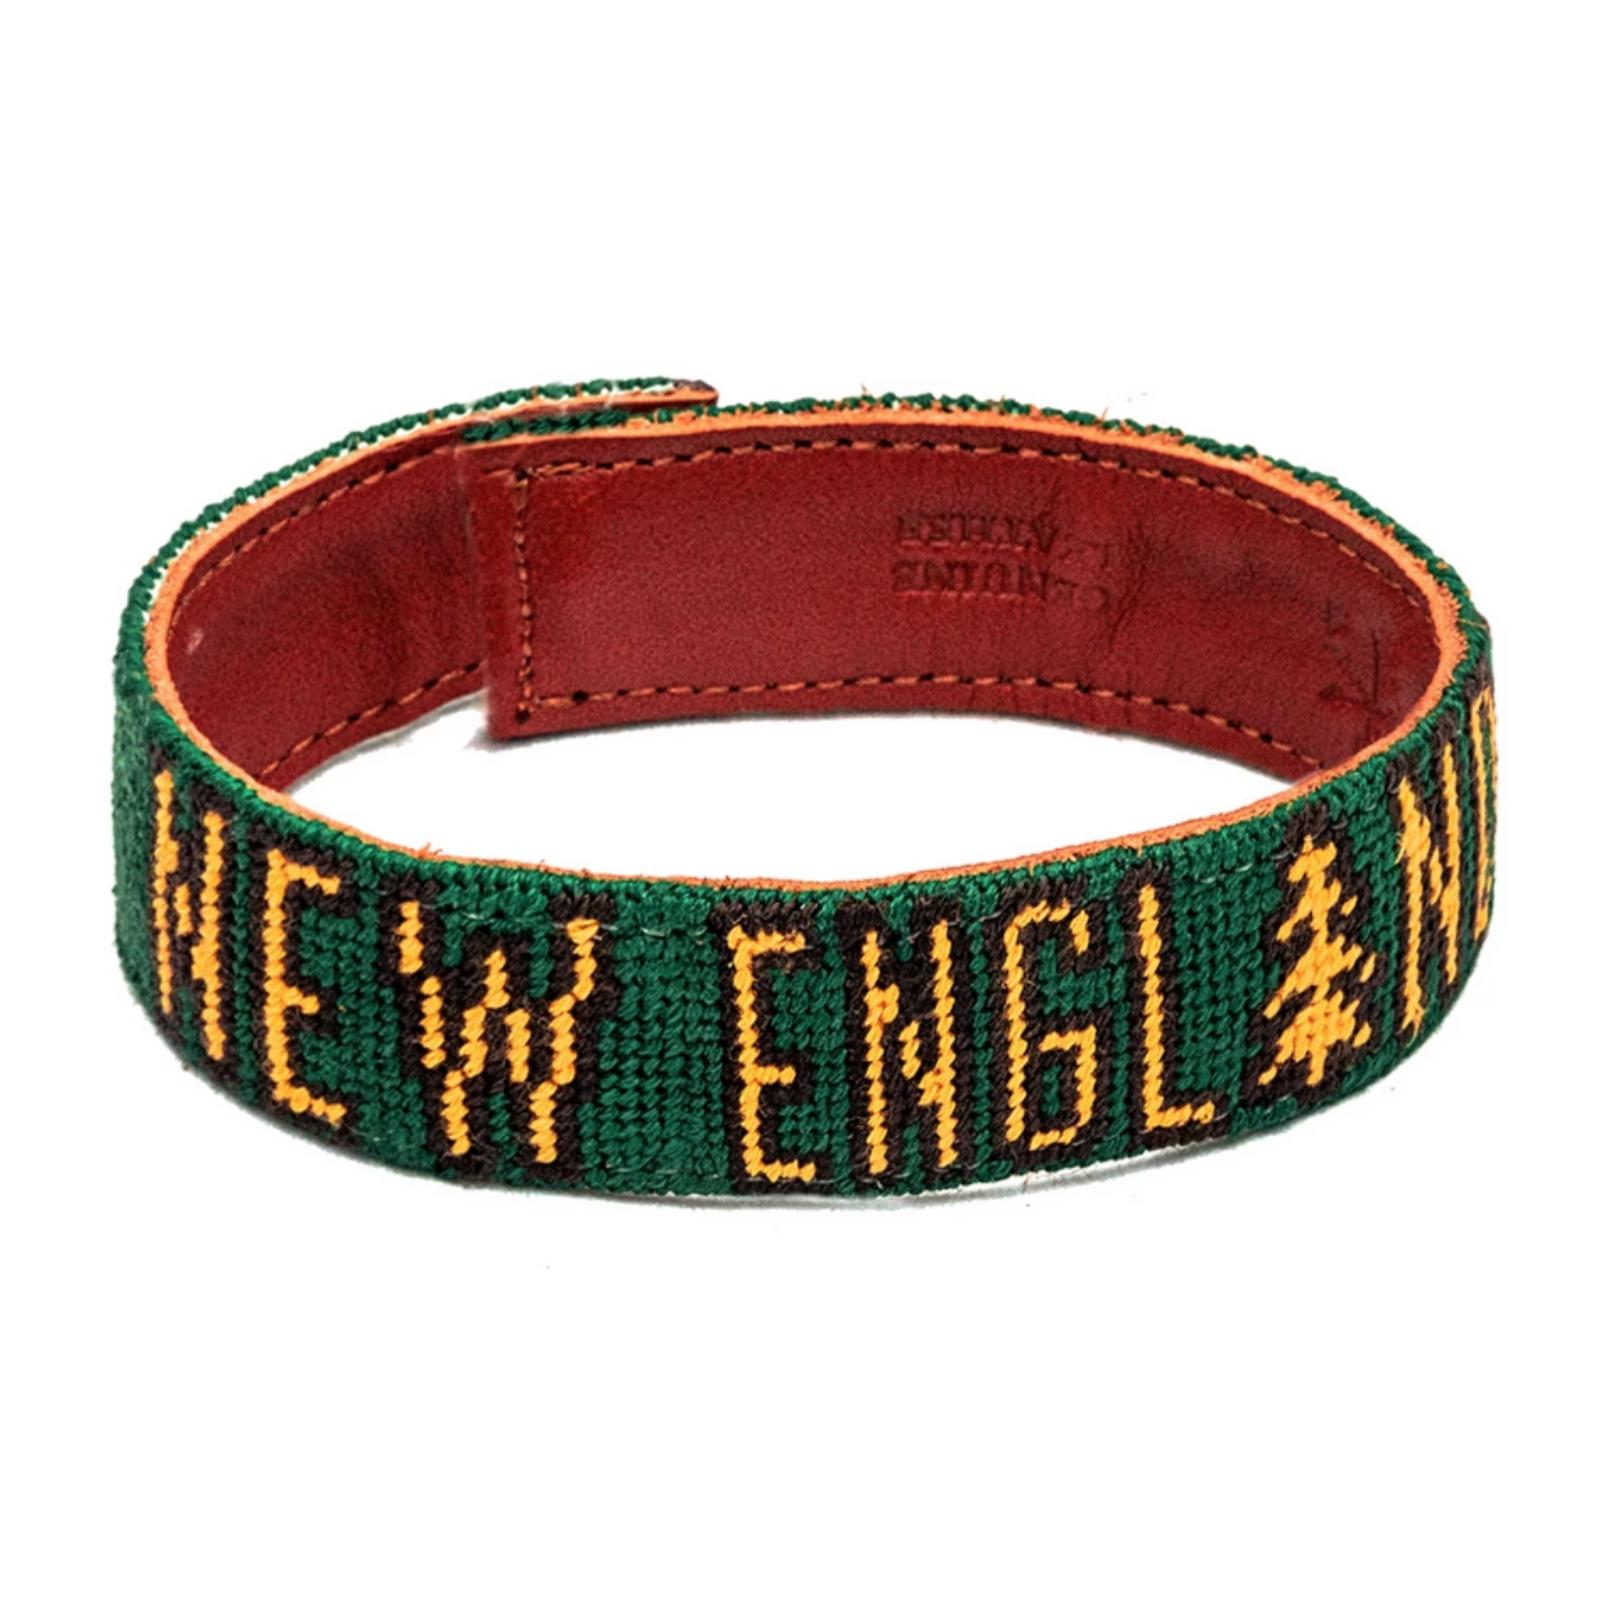 Kiel James Patrick Slap Bracelet - New England